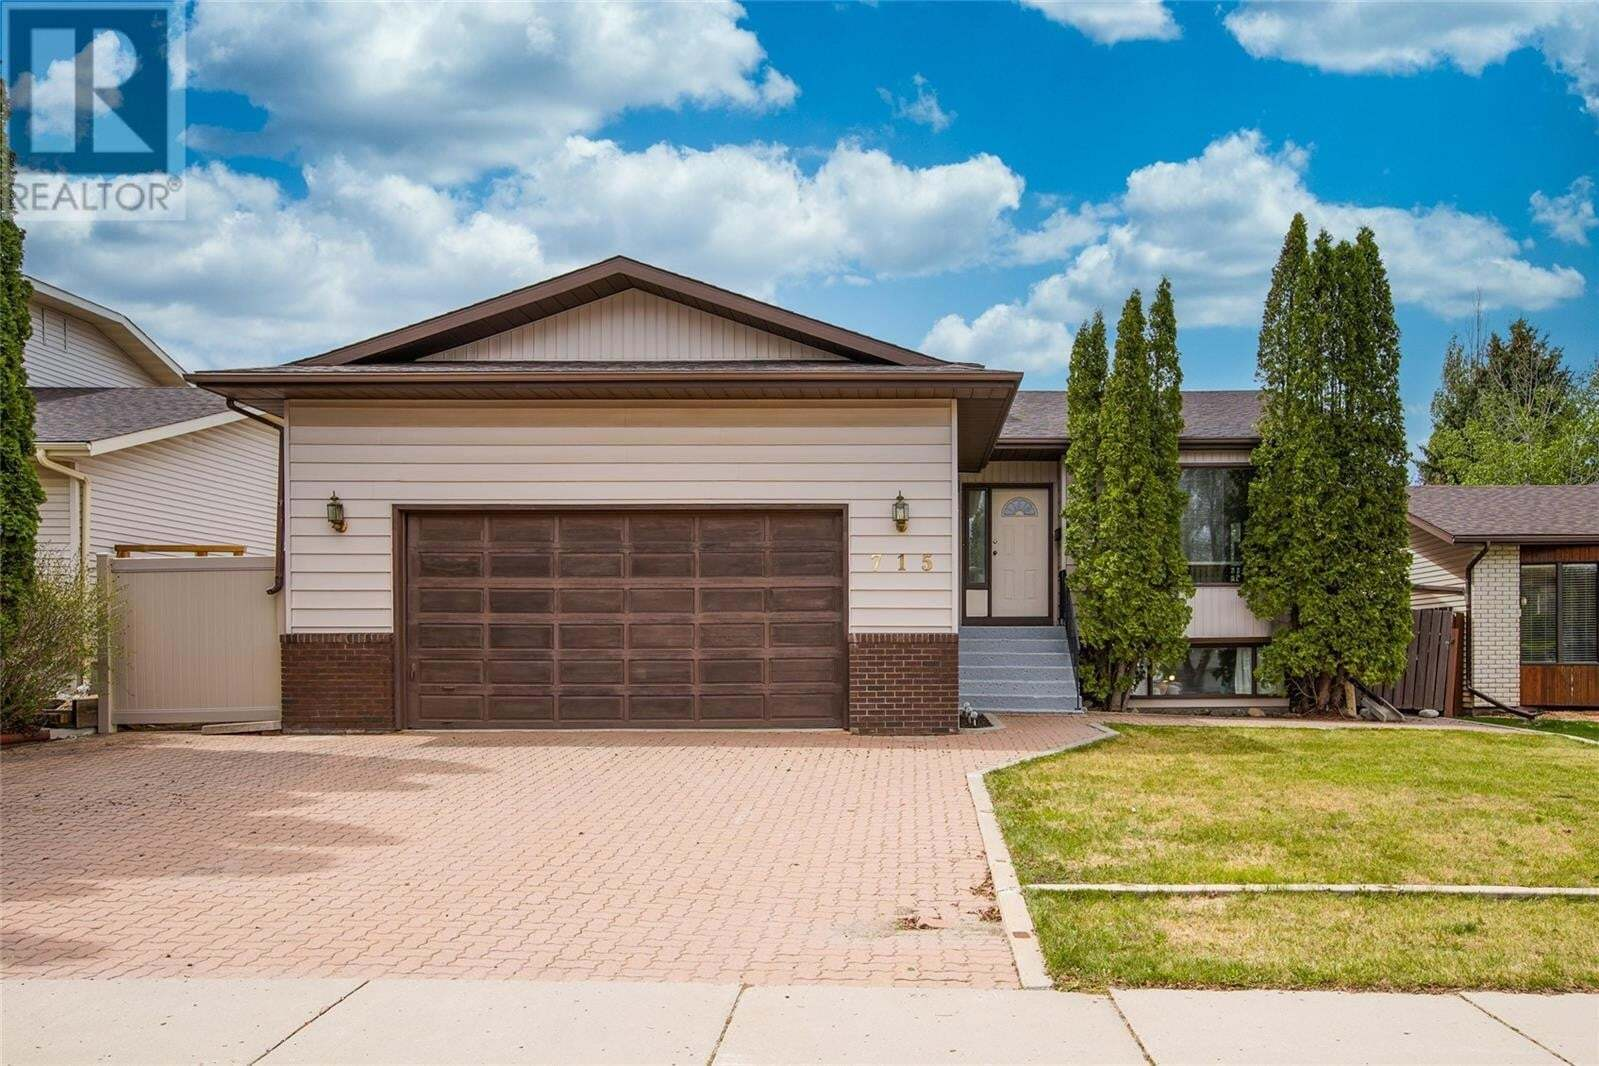 House for sale at 715 Wilkinson Wy Saskatoon Saskatchewan - MLS: SK809686